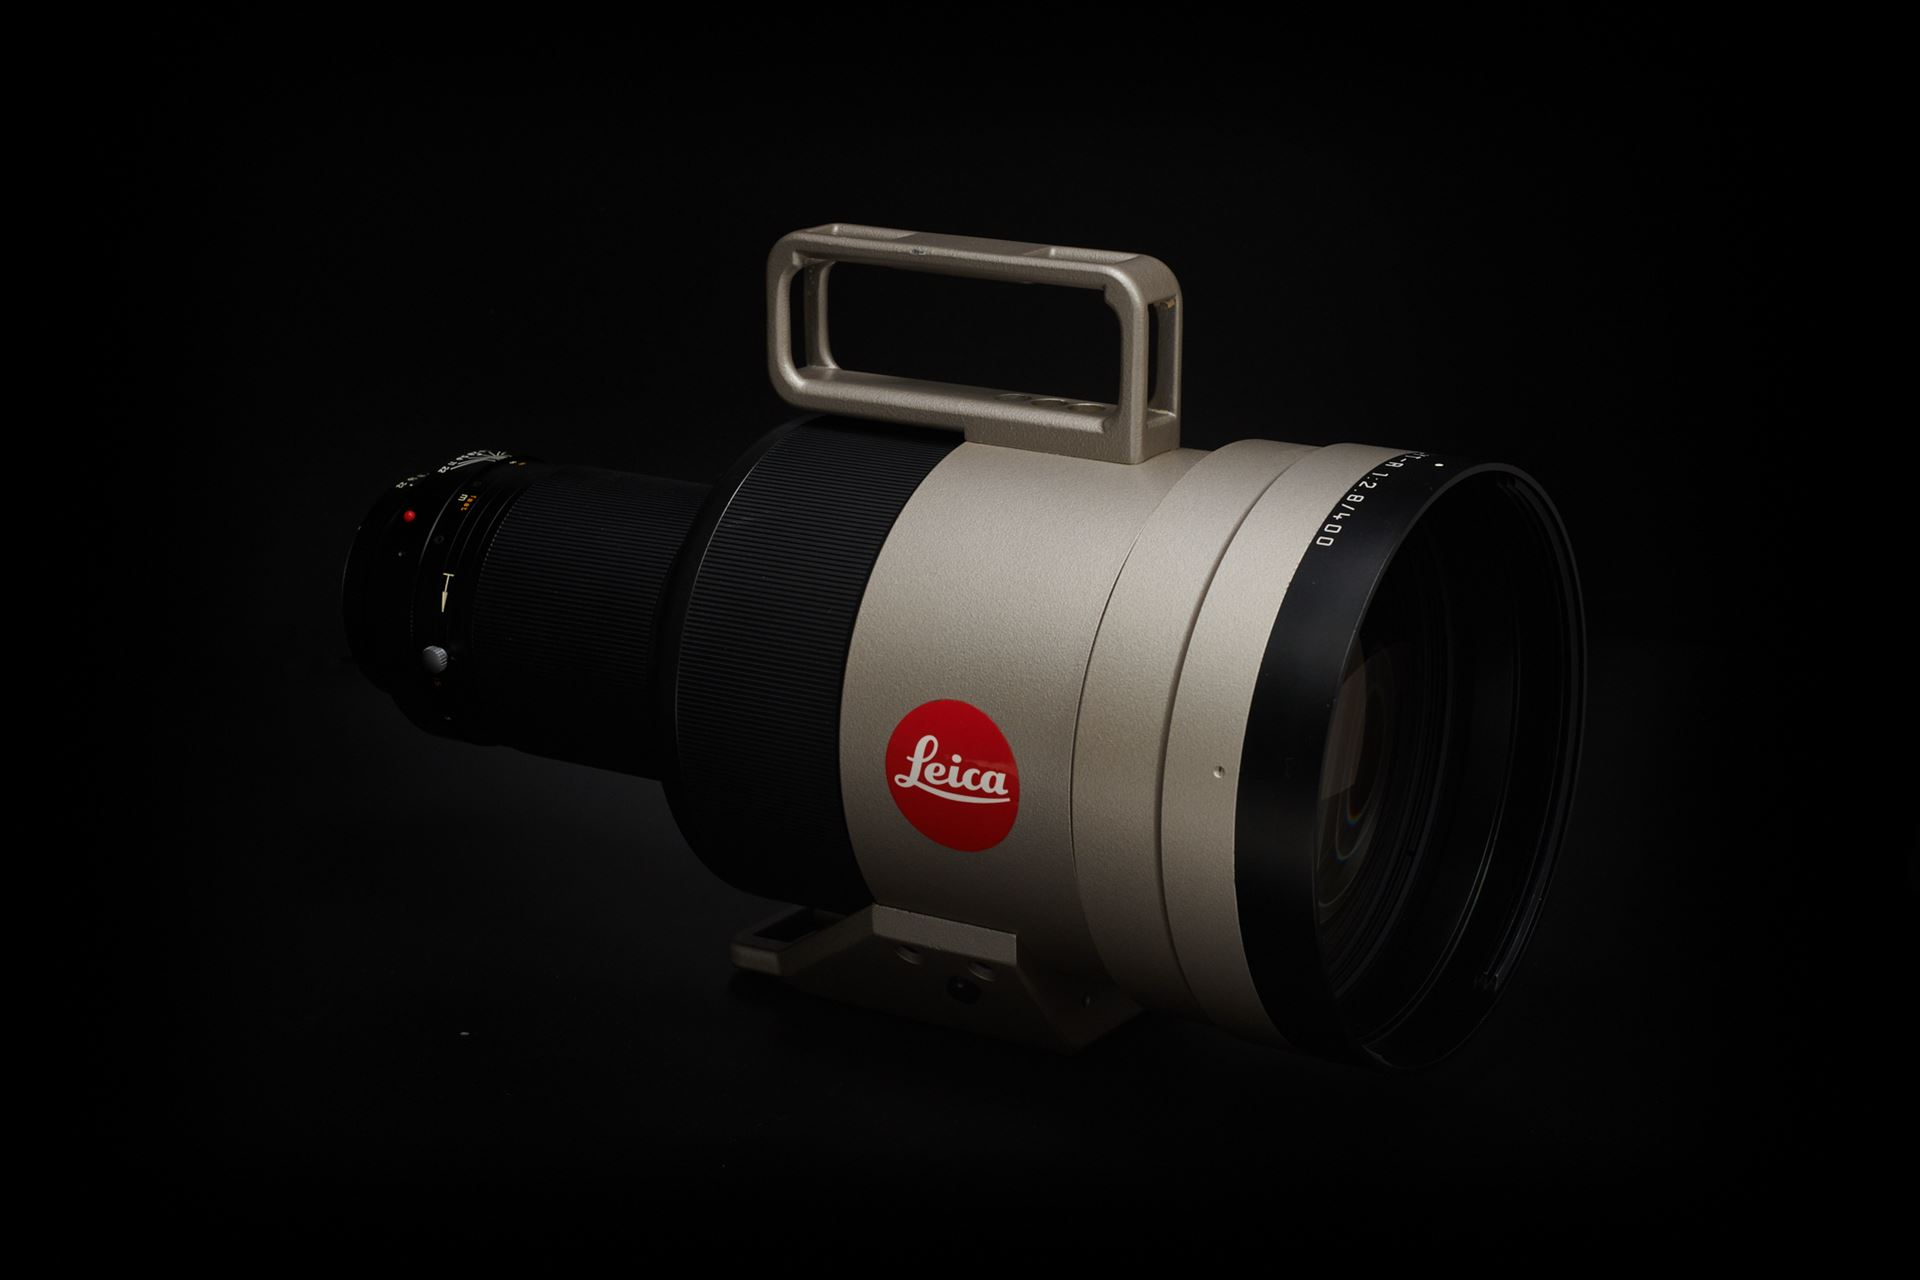 Picture of leica apo telyt-r 400mm f/2.8